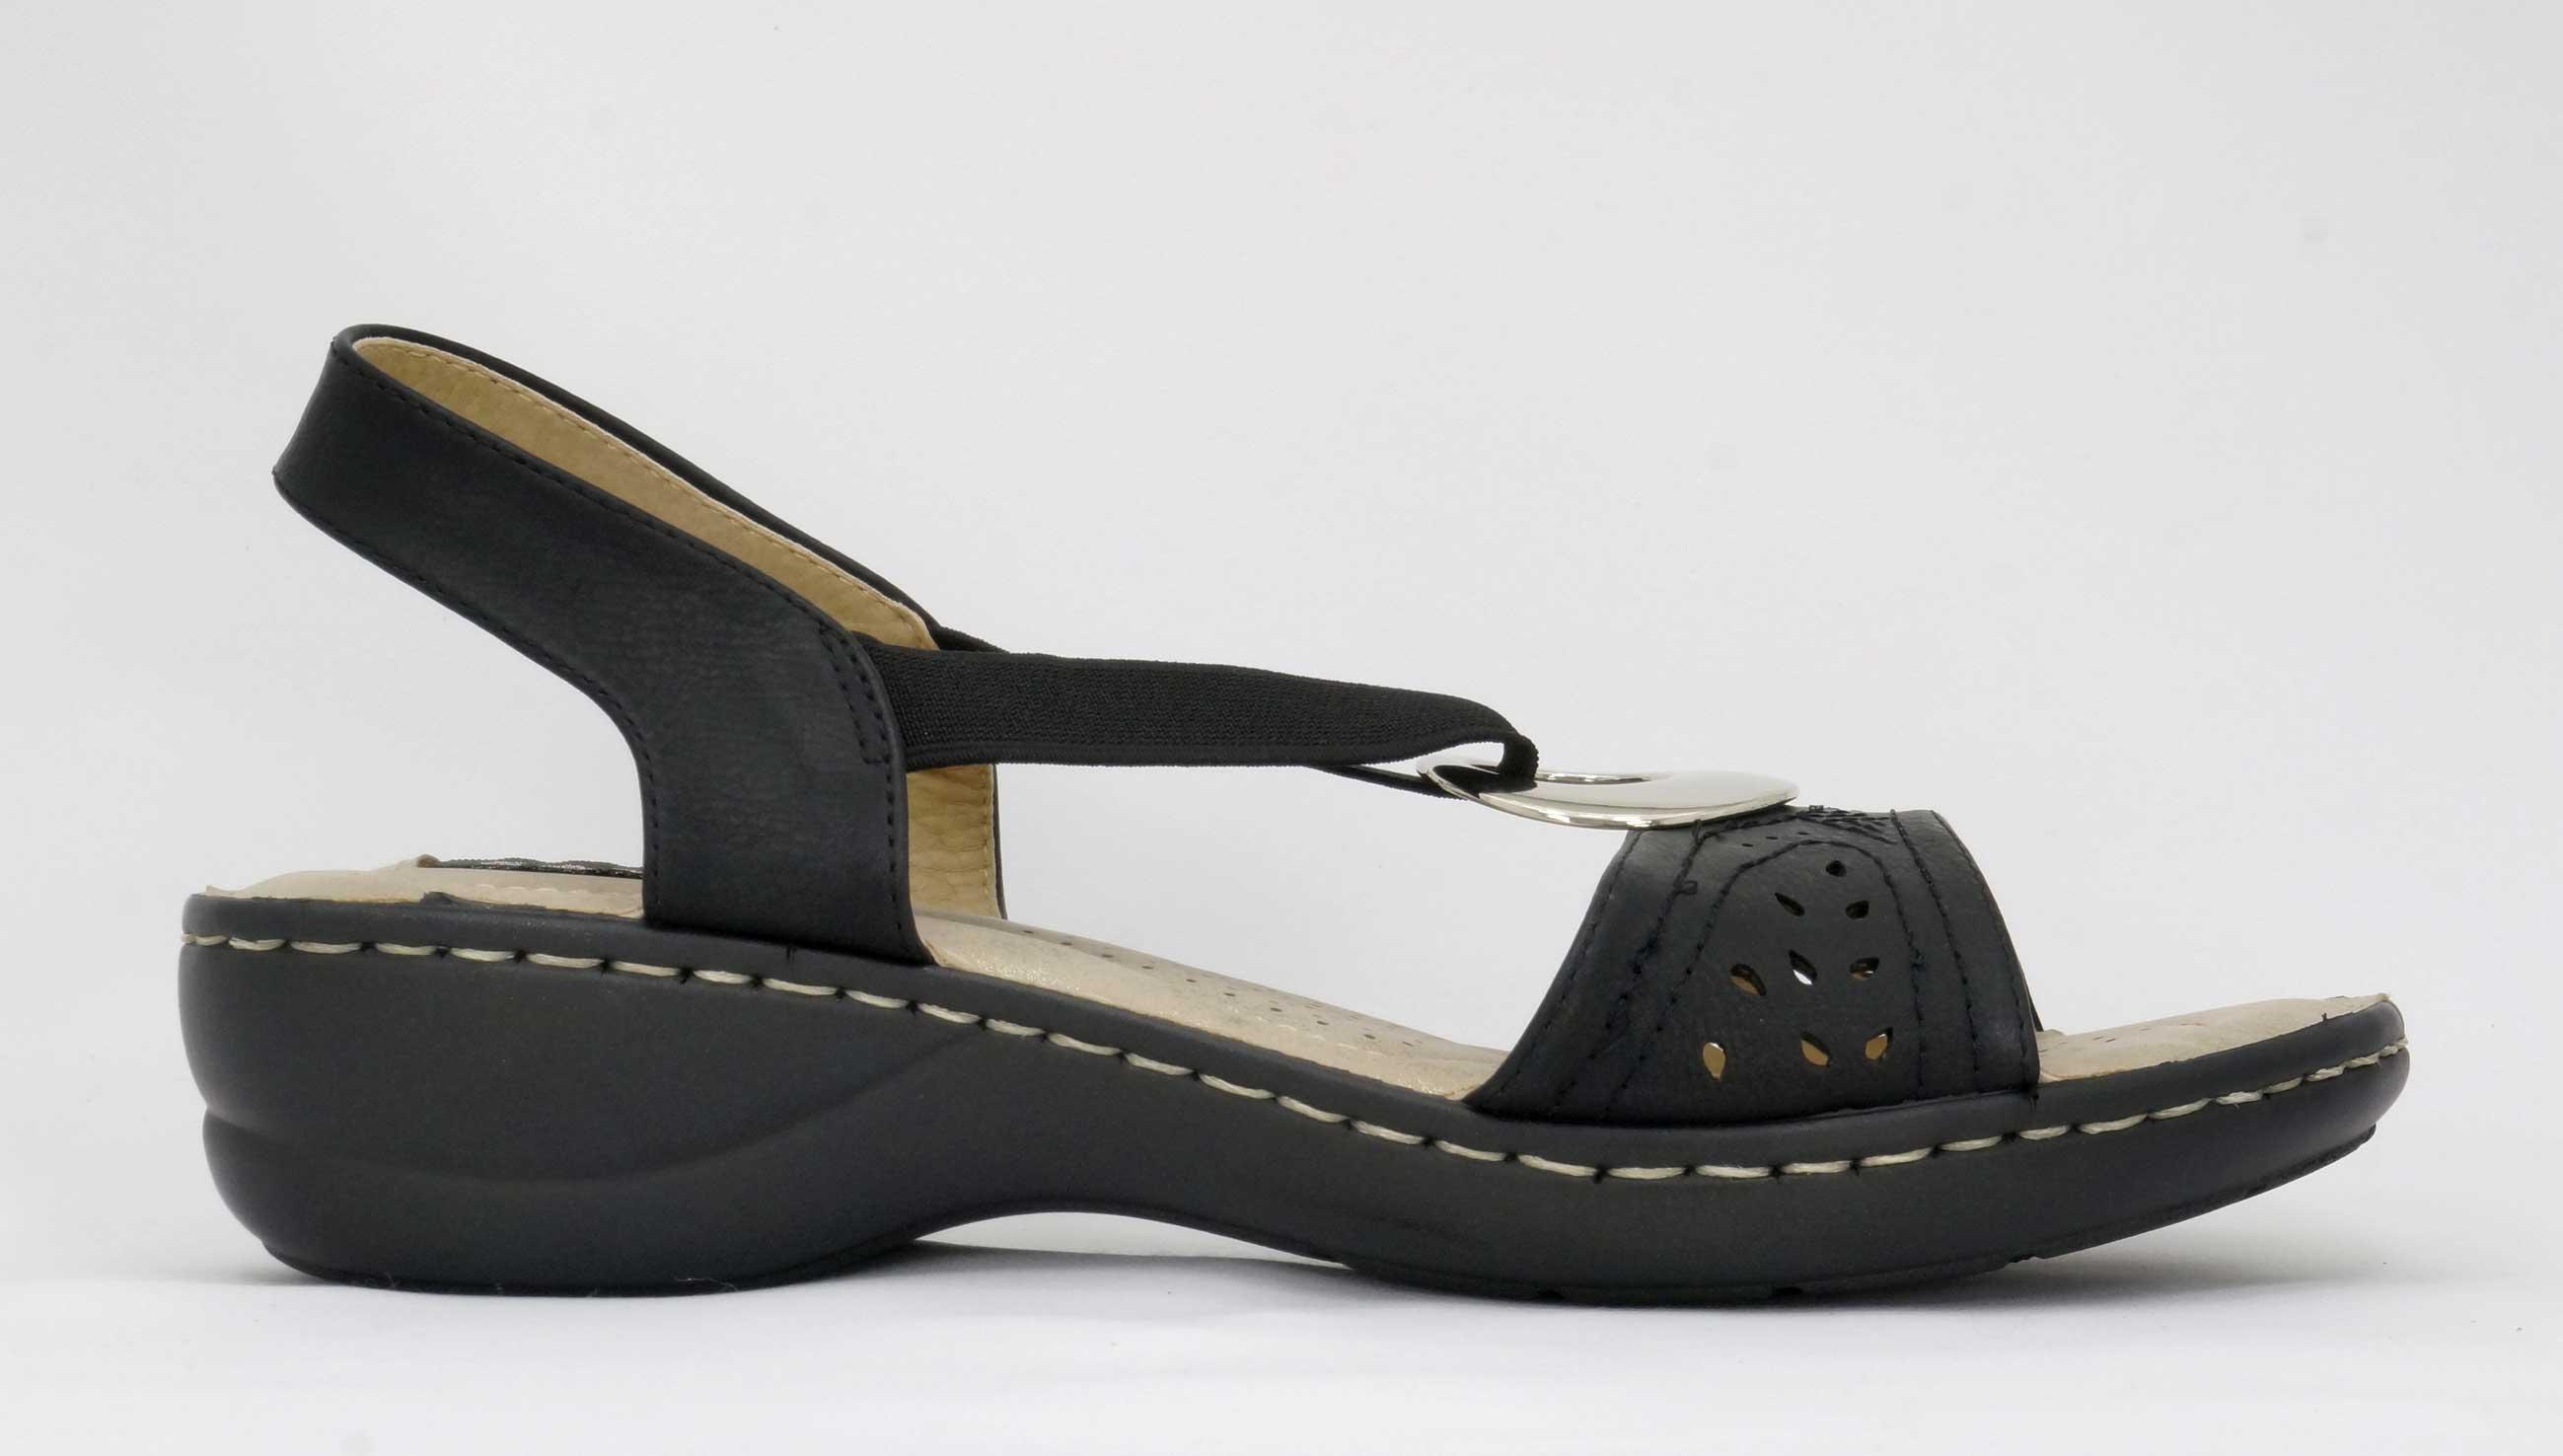 Savoy Black ladies comfort sandals with